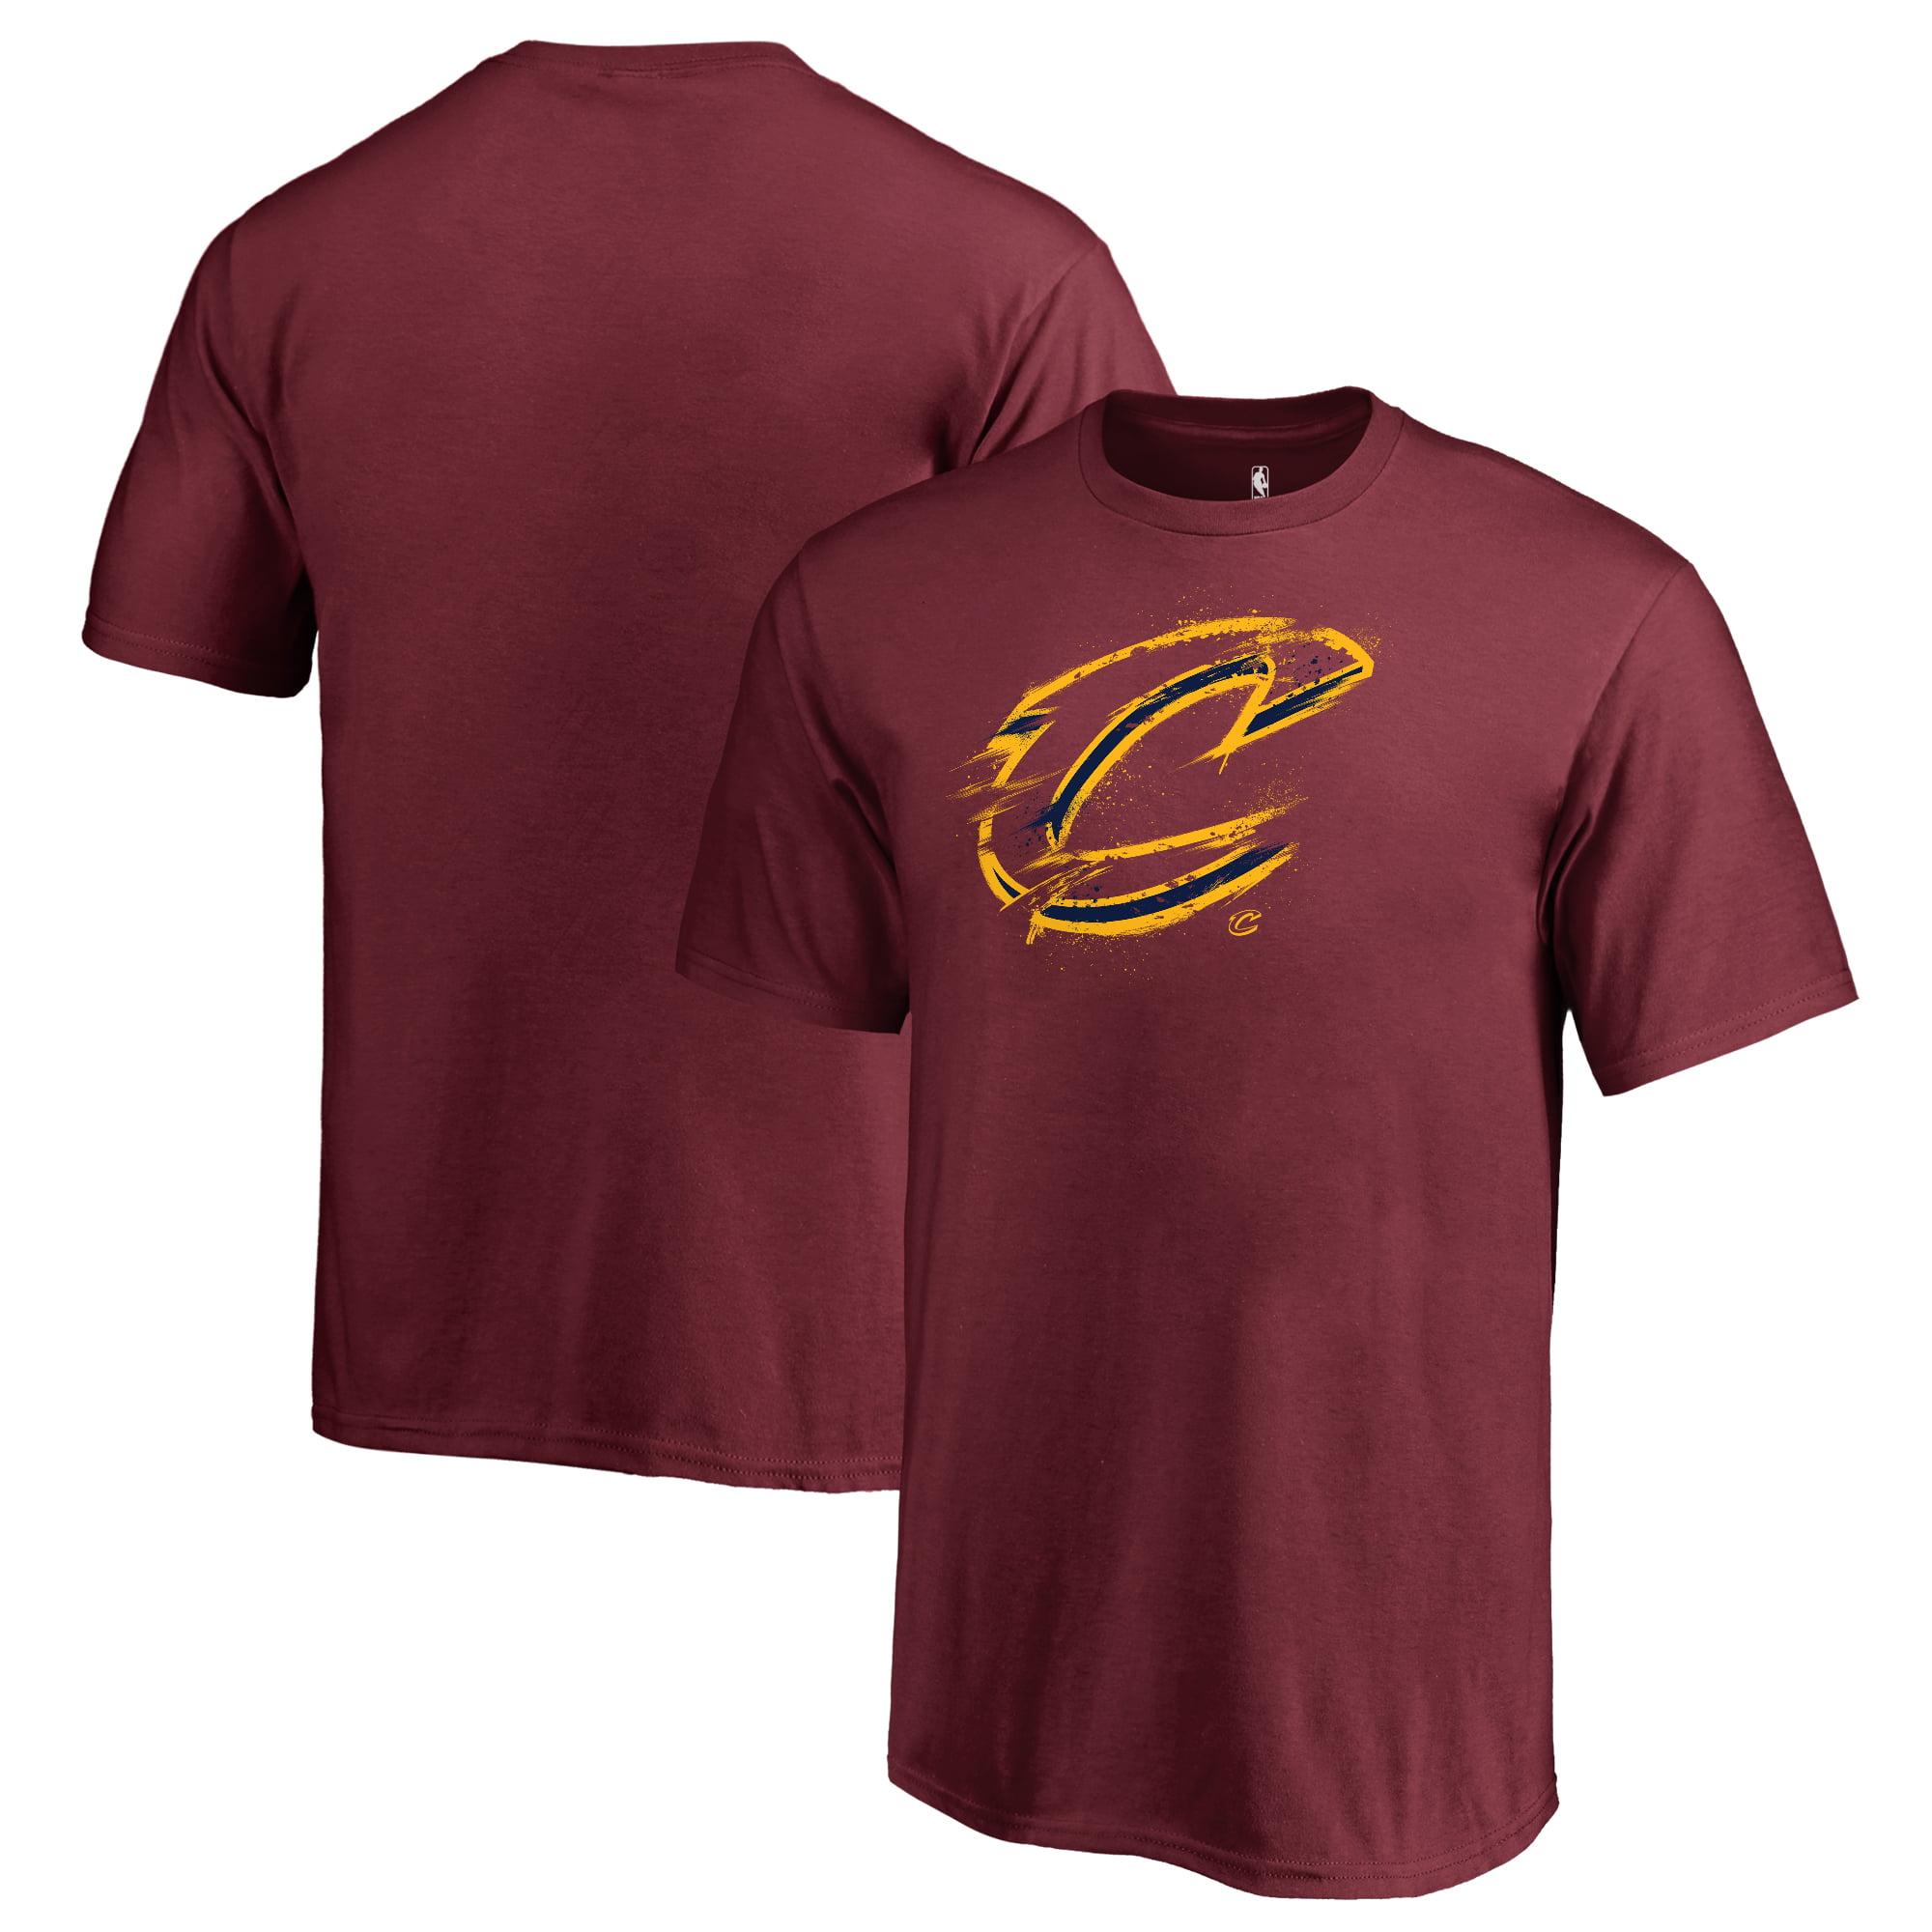 Cleveland Cavaliers Fanatics Branded Youth Splatter Logo T-Shirt - Wine